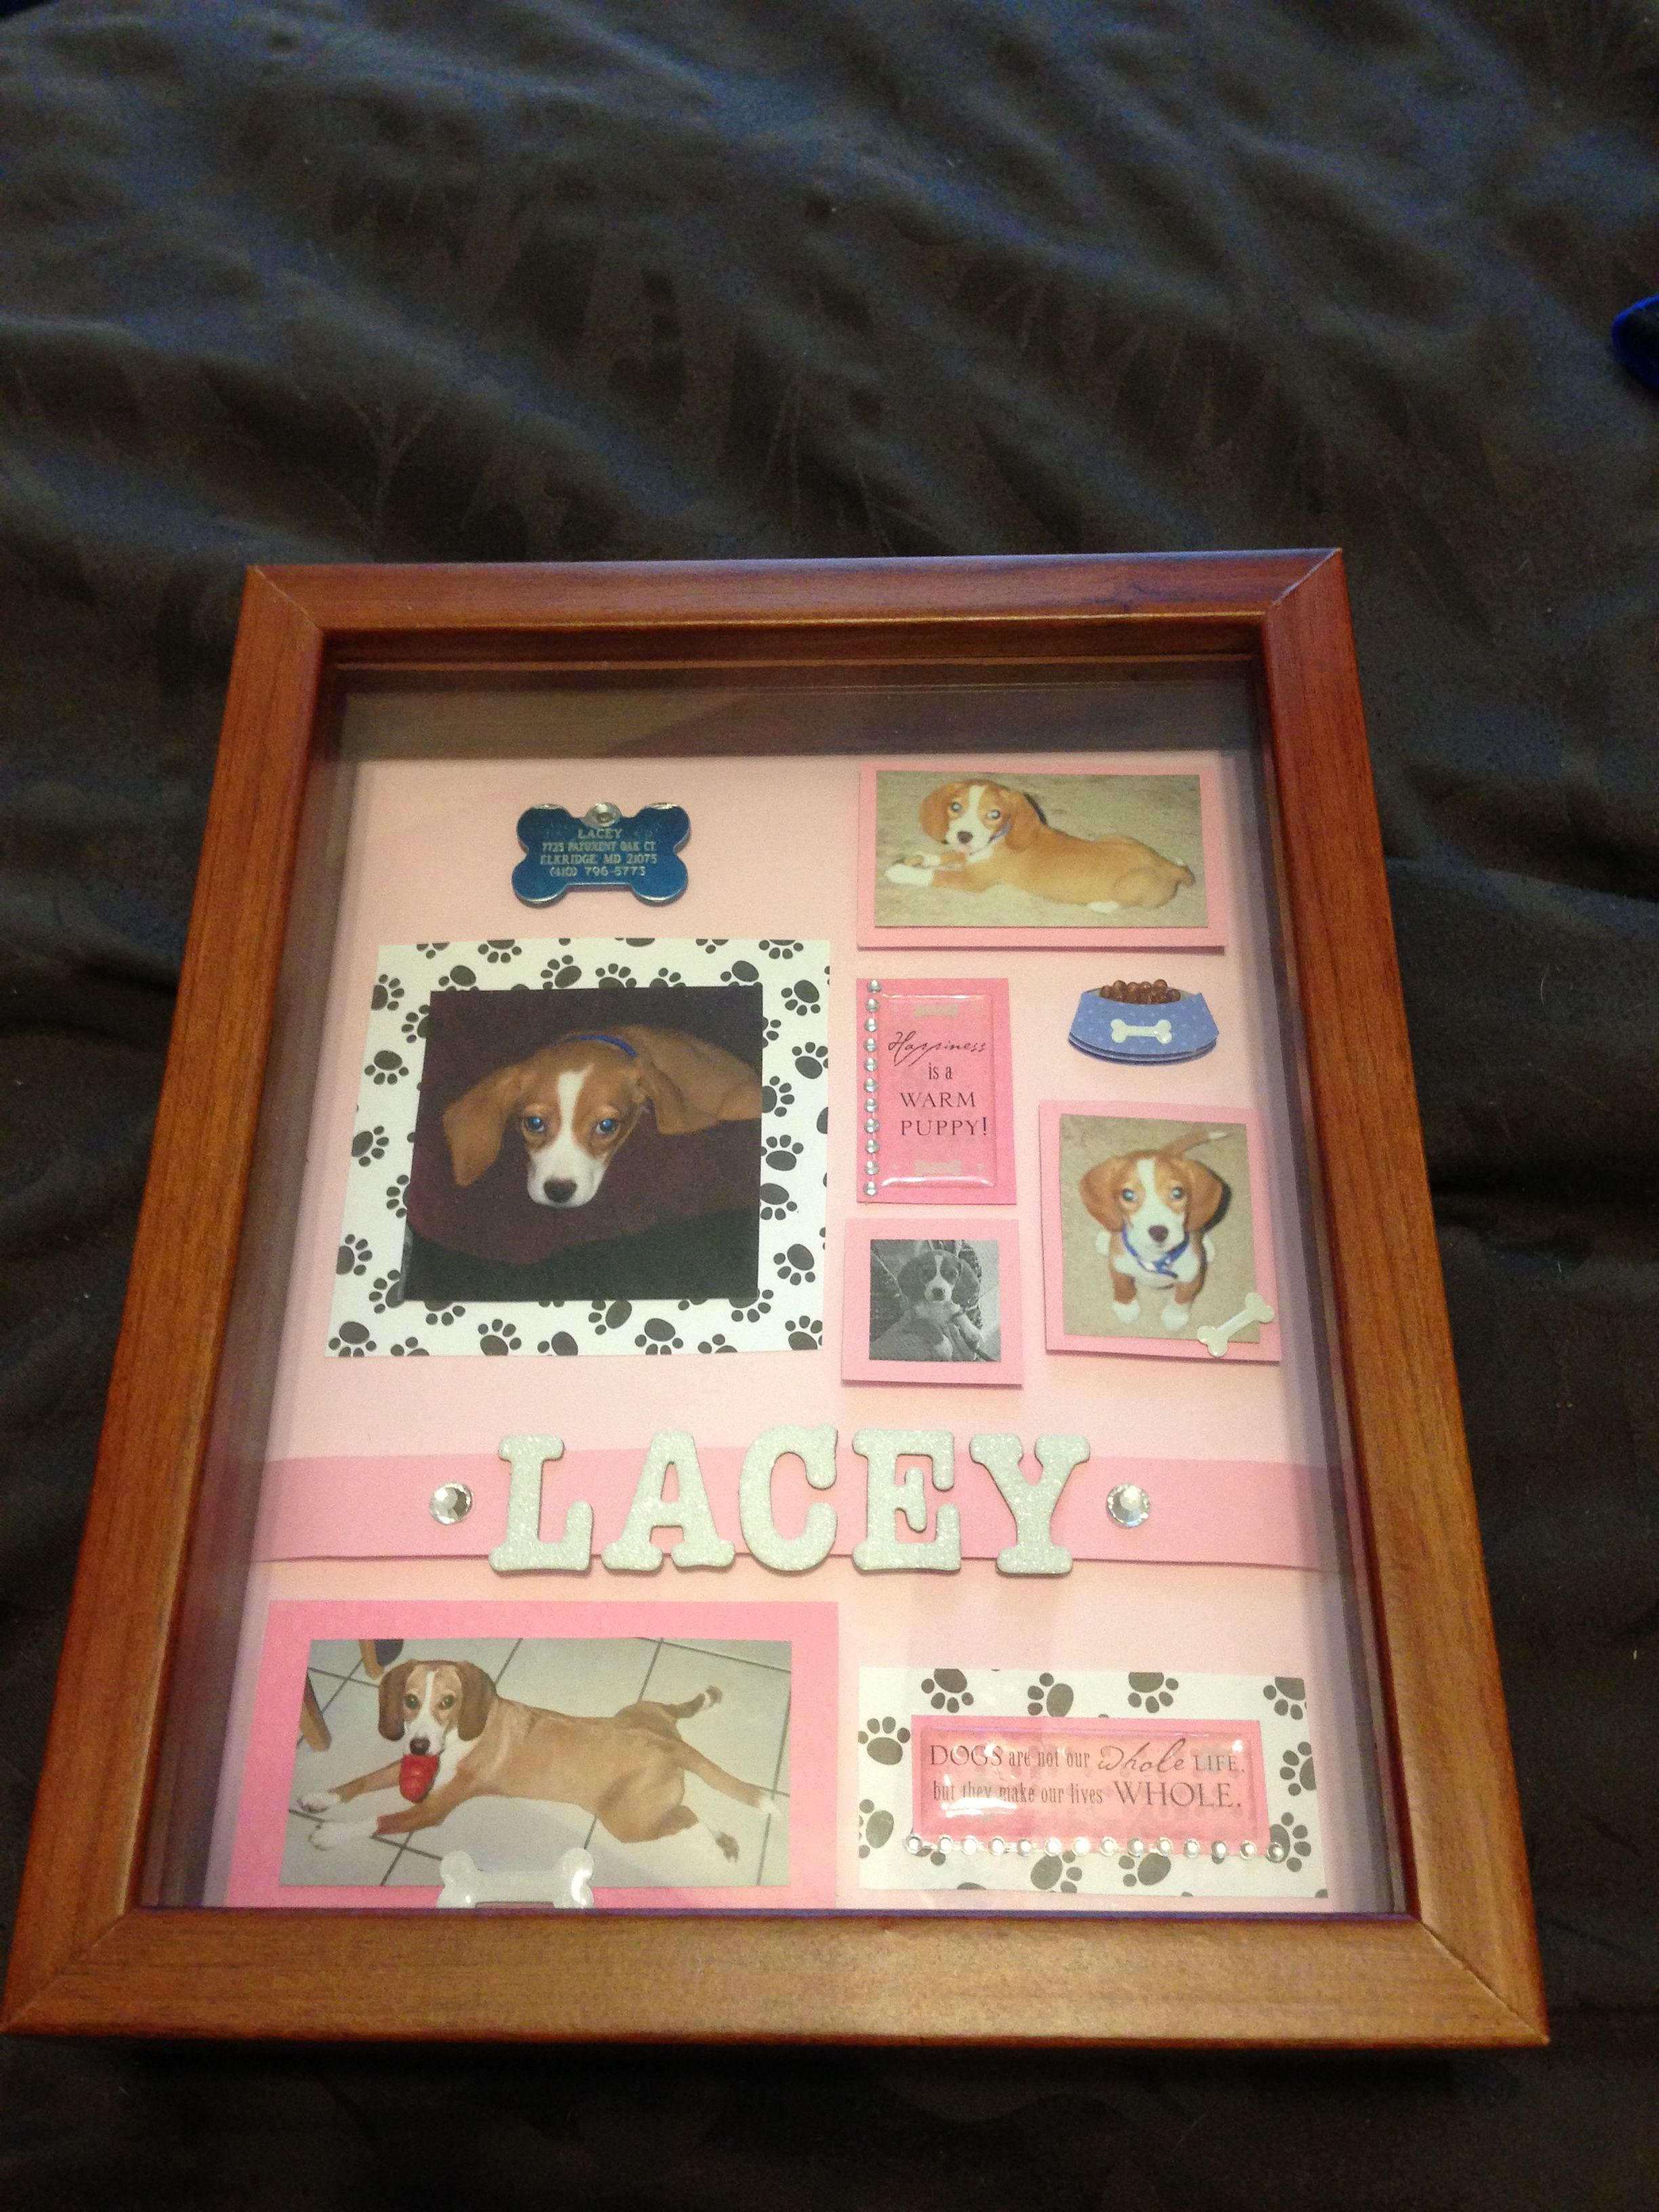 shadow memory box of my beloved deceased dog craft ideas perros mascotas. Black Bedroom Furniture Sets. Home Design Ideas